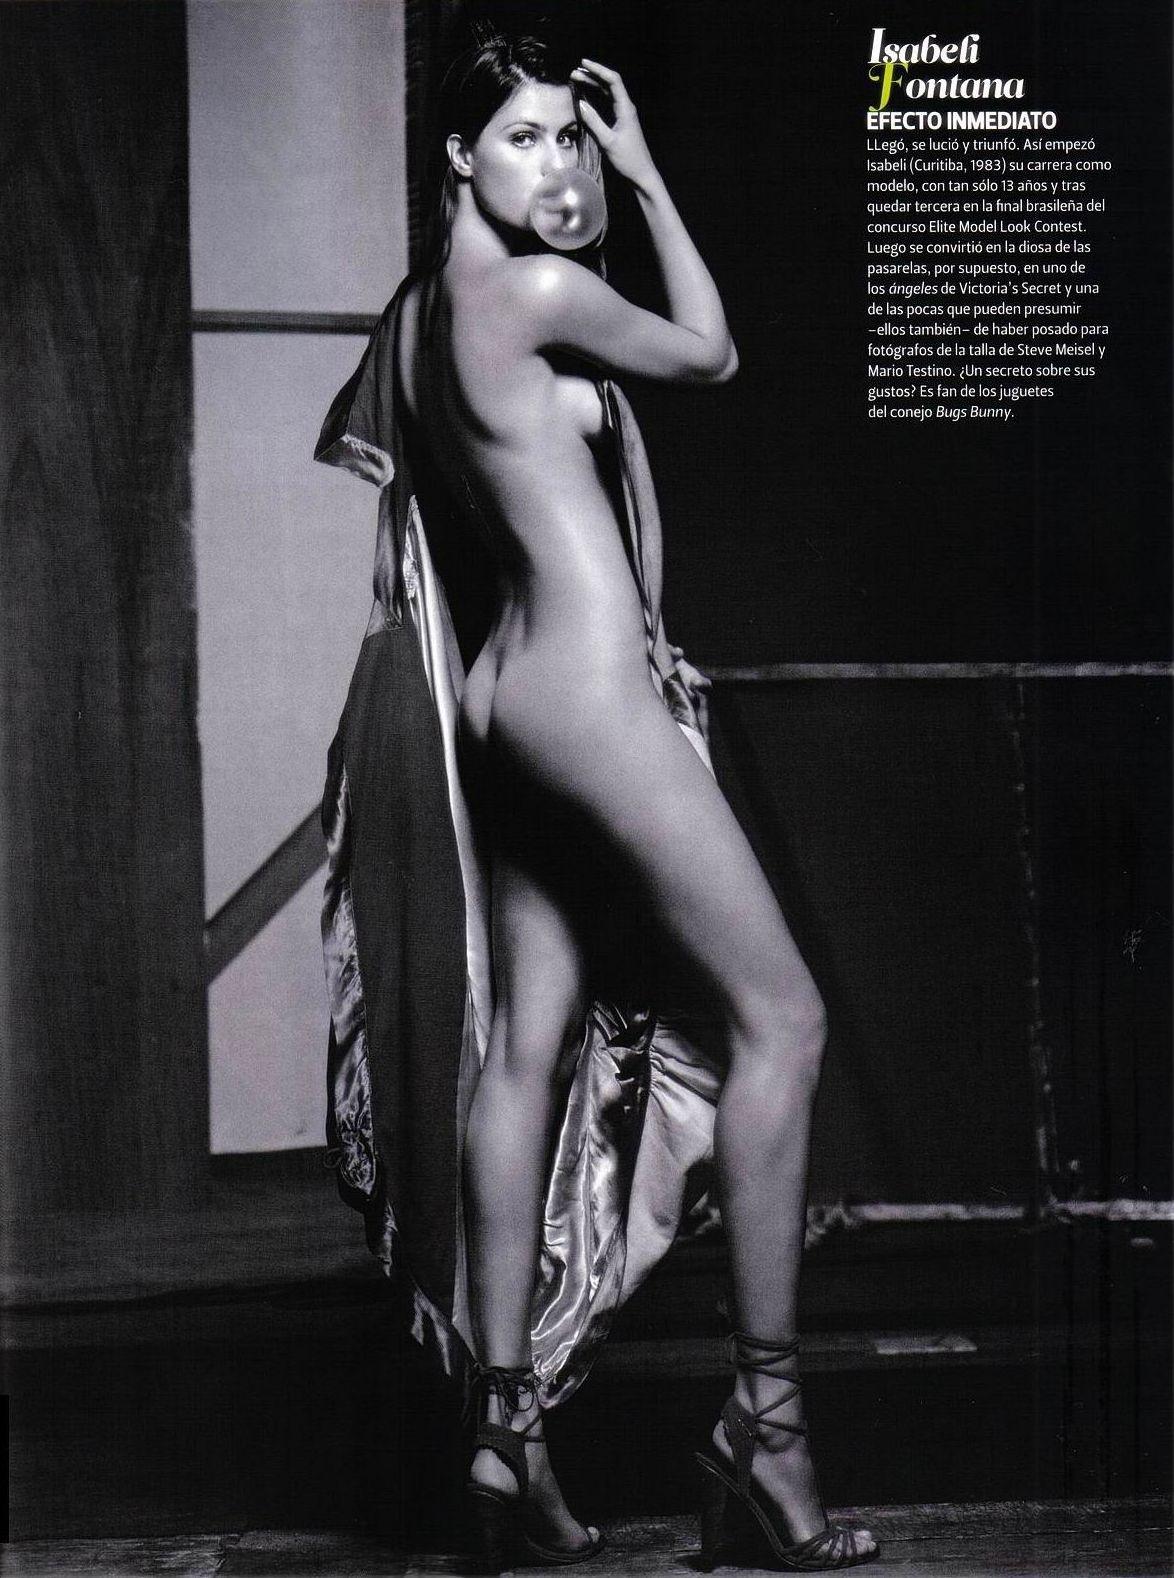 http://4.bp.blogspot.com/_pGTlBw_z2AM/TOb92FgGPZI/AAAAAAAABDo/d0EbqF7dou0/s1600/Isabeli+Fontana+nude+naked+nue+desnuda+DT.jpg